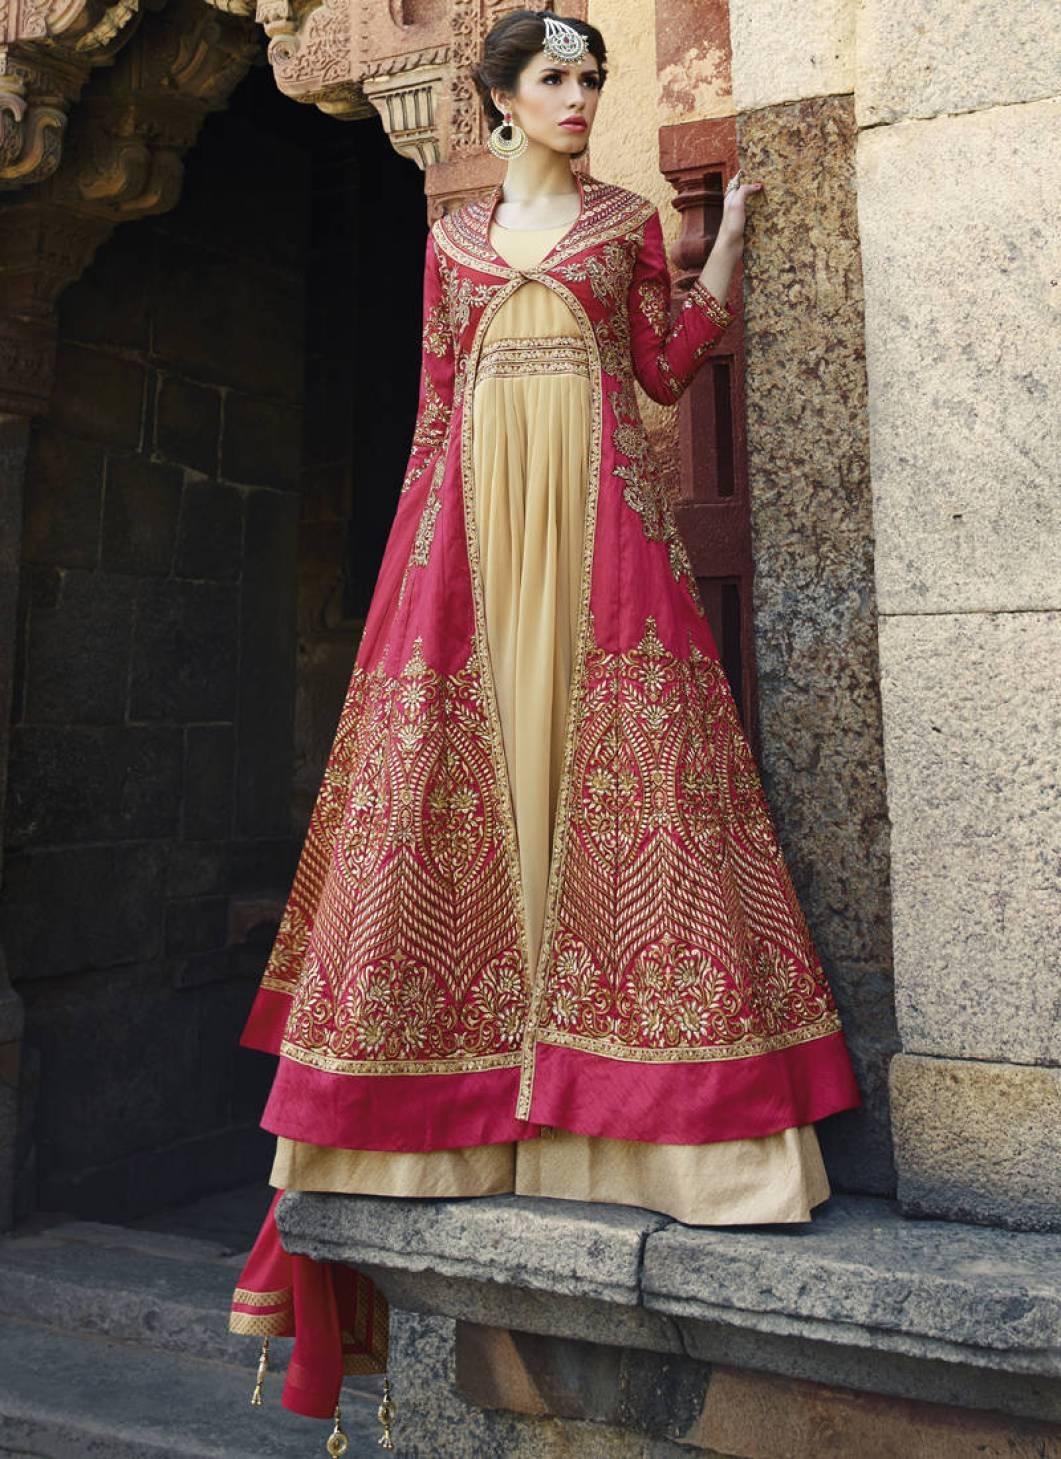 Attires India fashion